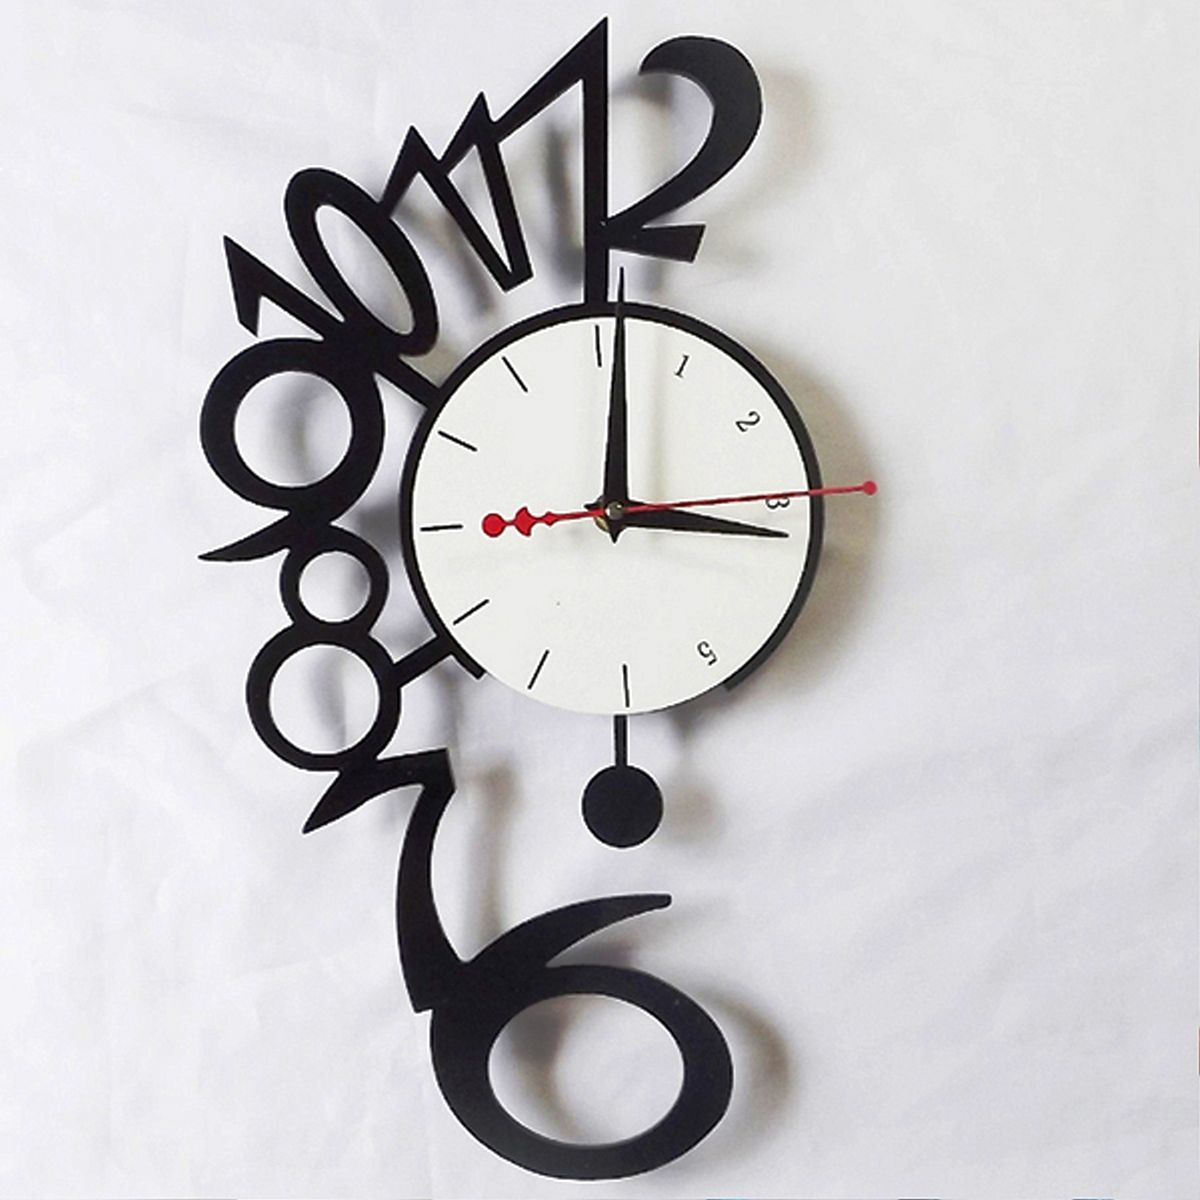 22 Best Unique Home Clock Ideas For Amazing Wall Decoration Freshouz Com Cool Clocks Home Clock Diy Clock Wall